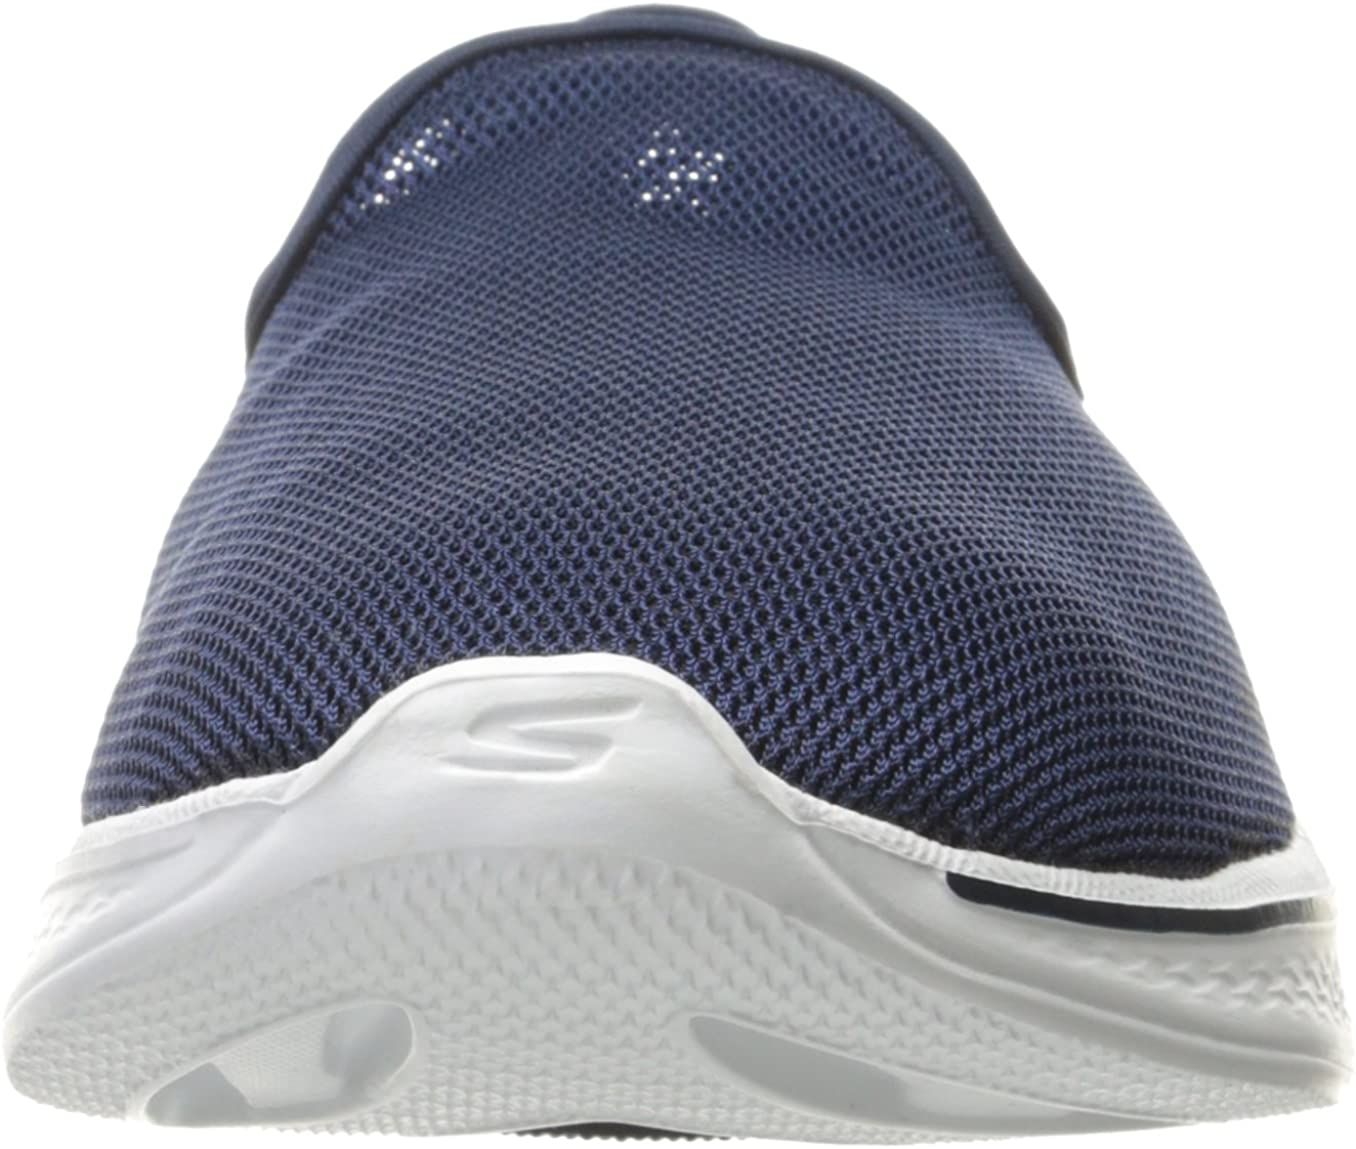 Skechers14906 - Go Walk 4 - Airy Femme Bleu Marine Blanc